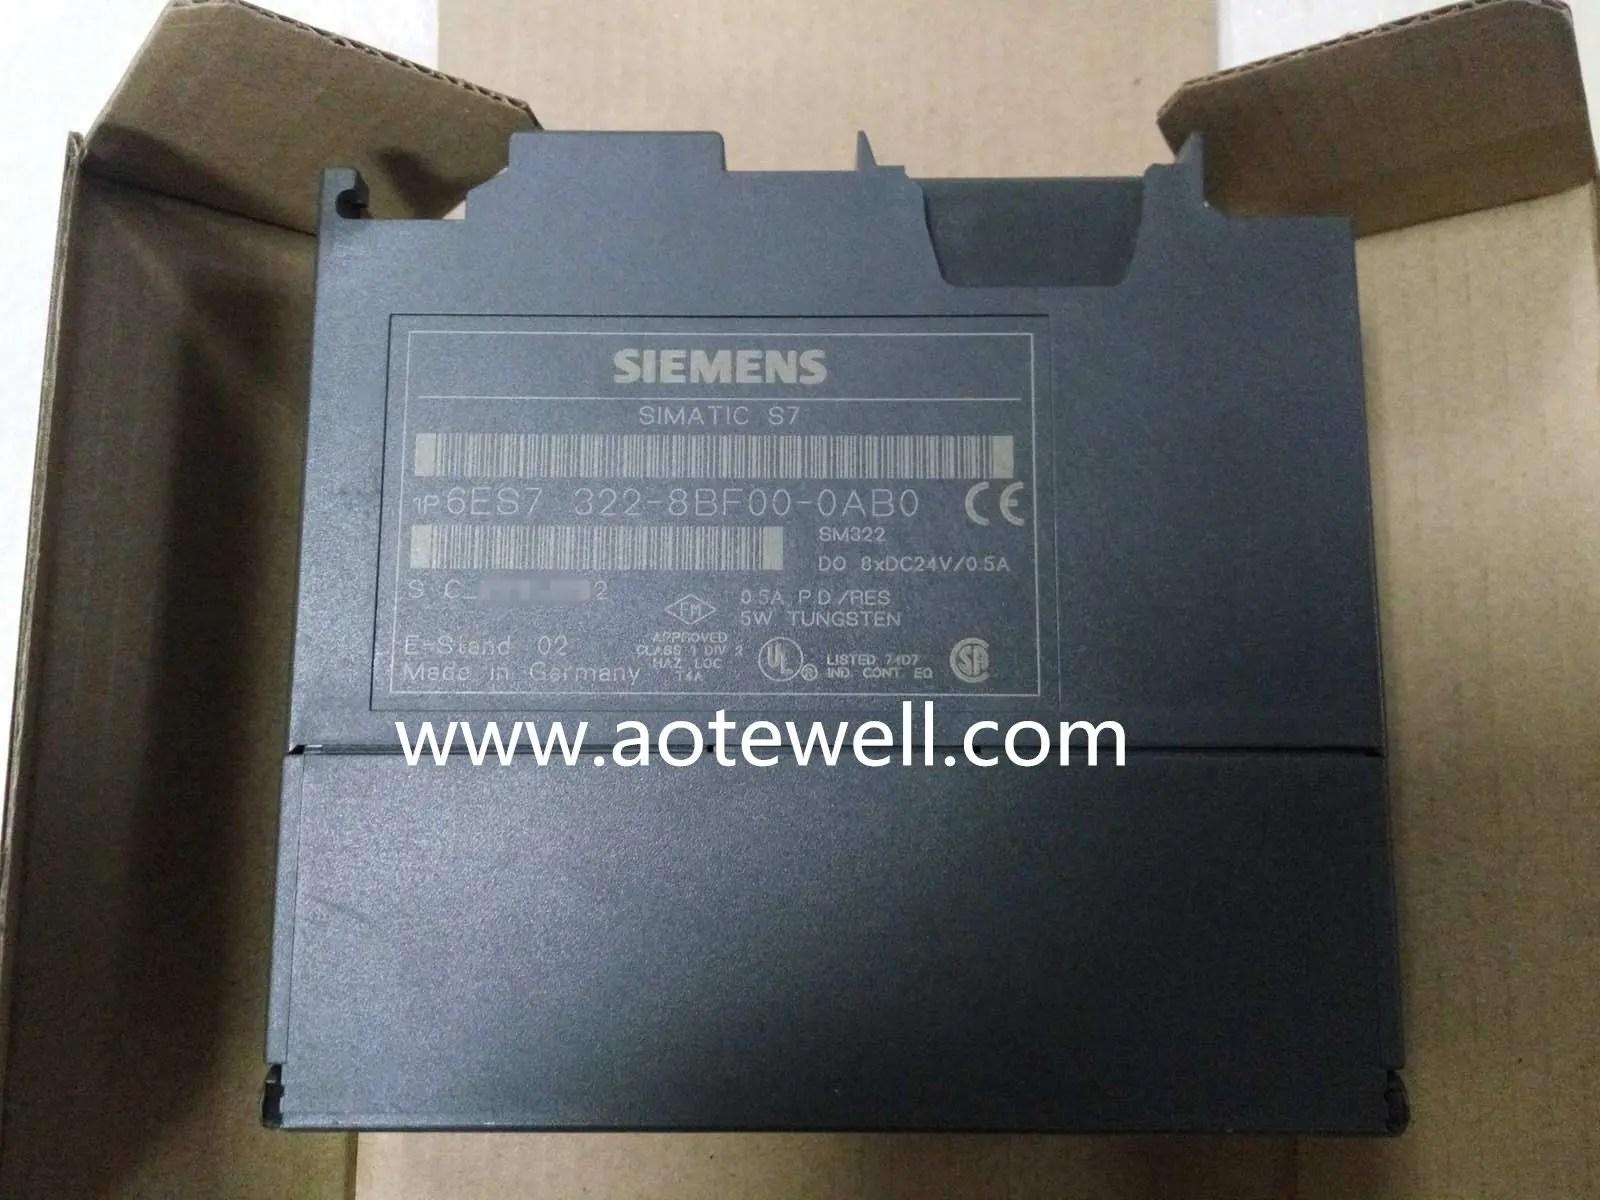 Siemens 6ES7 322-1BL00-0AA0 E-stand:8 LAST VERSION SM322 PLC S7-300